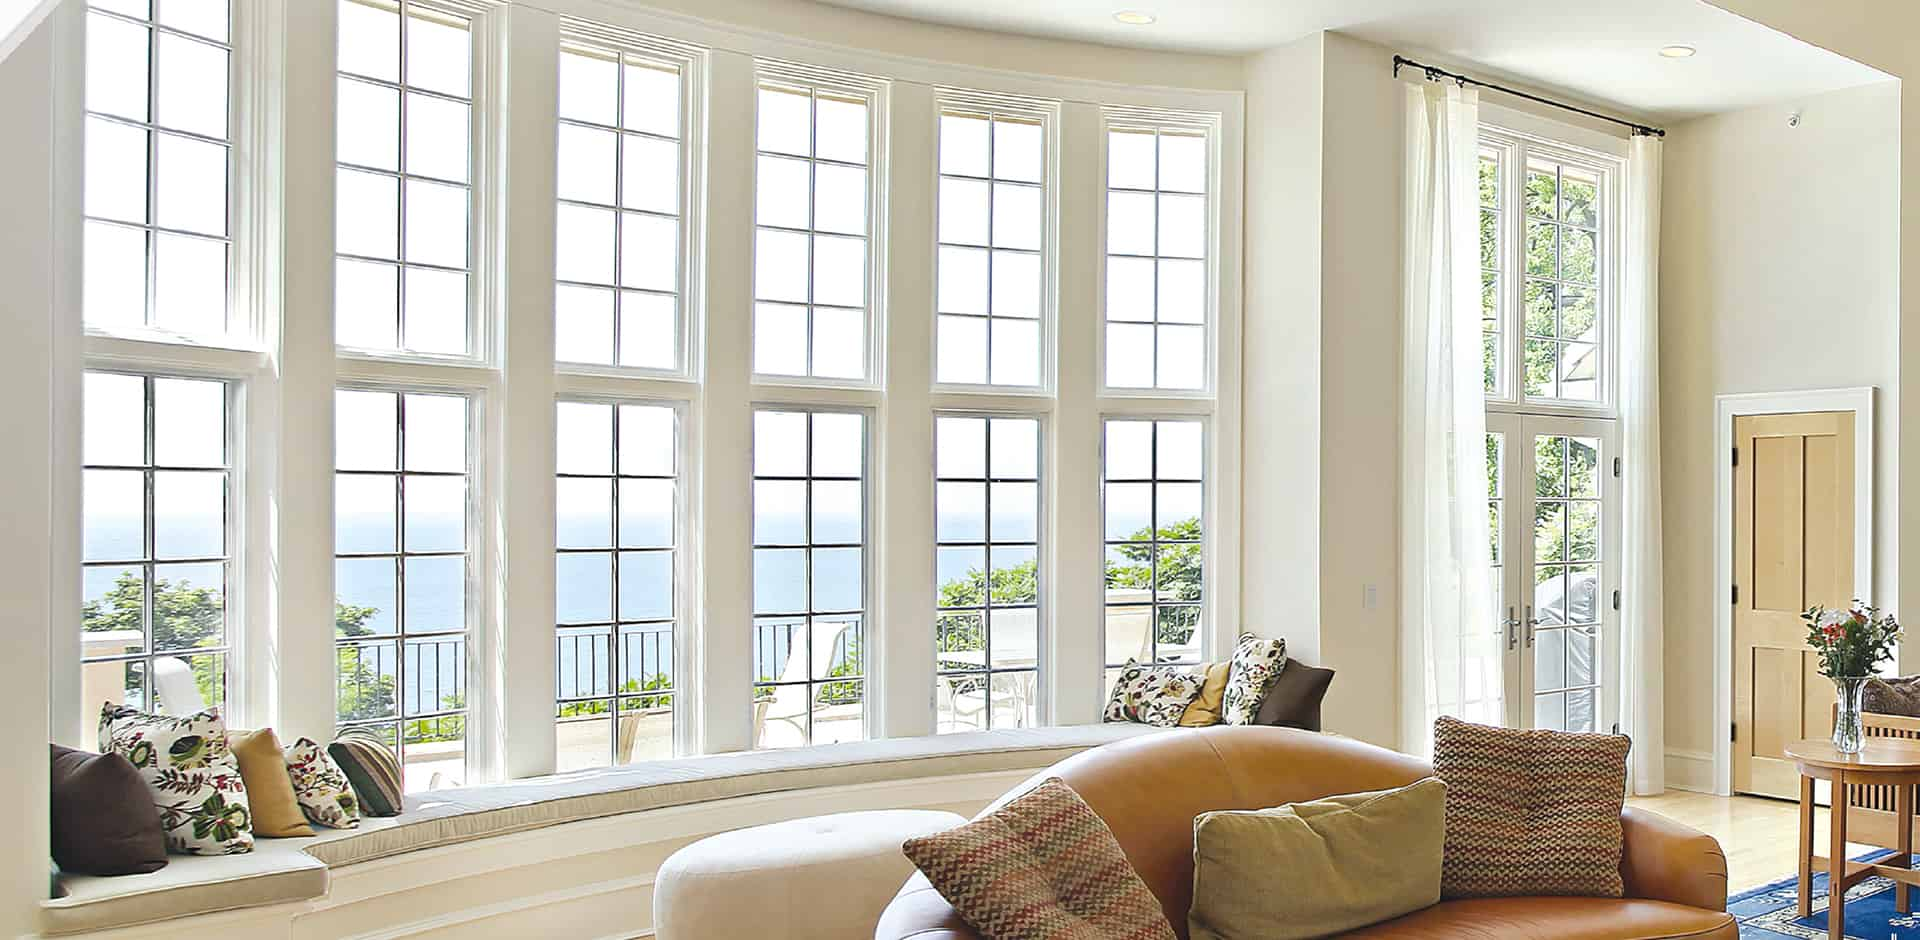 Nice Understanding Energy Ratings For Windows And Doors